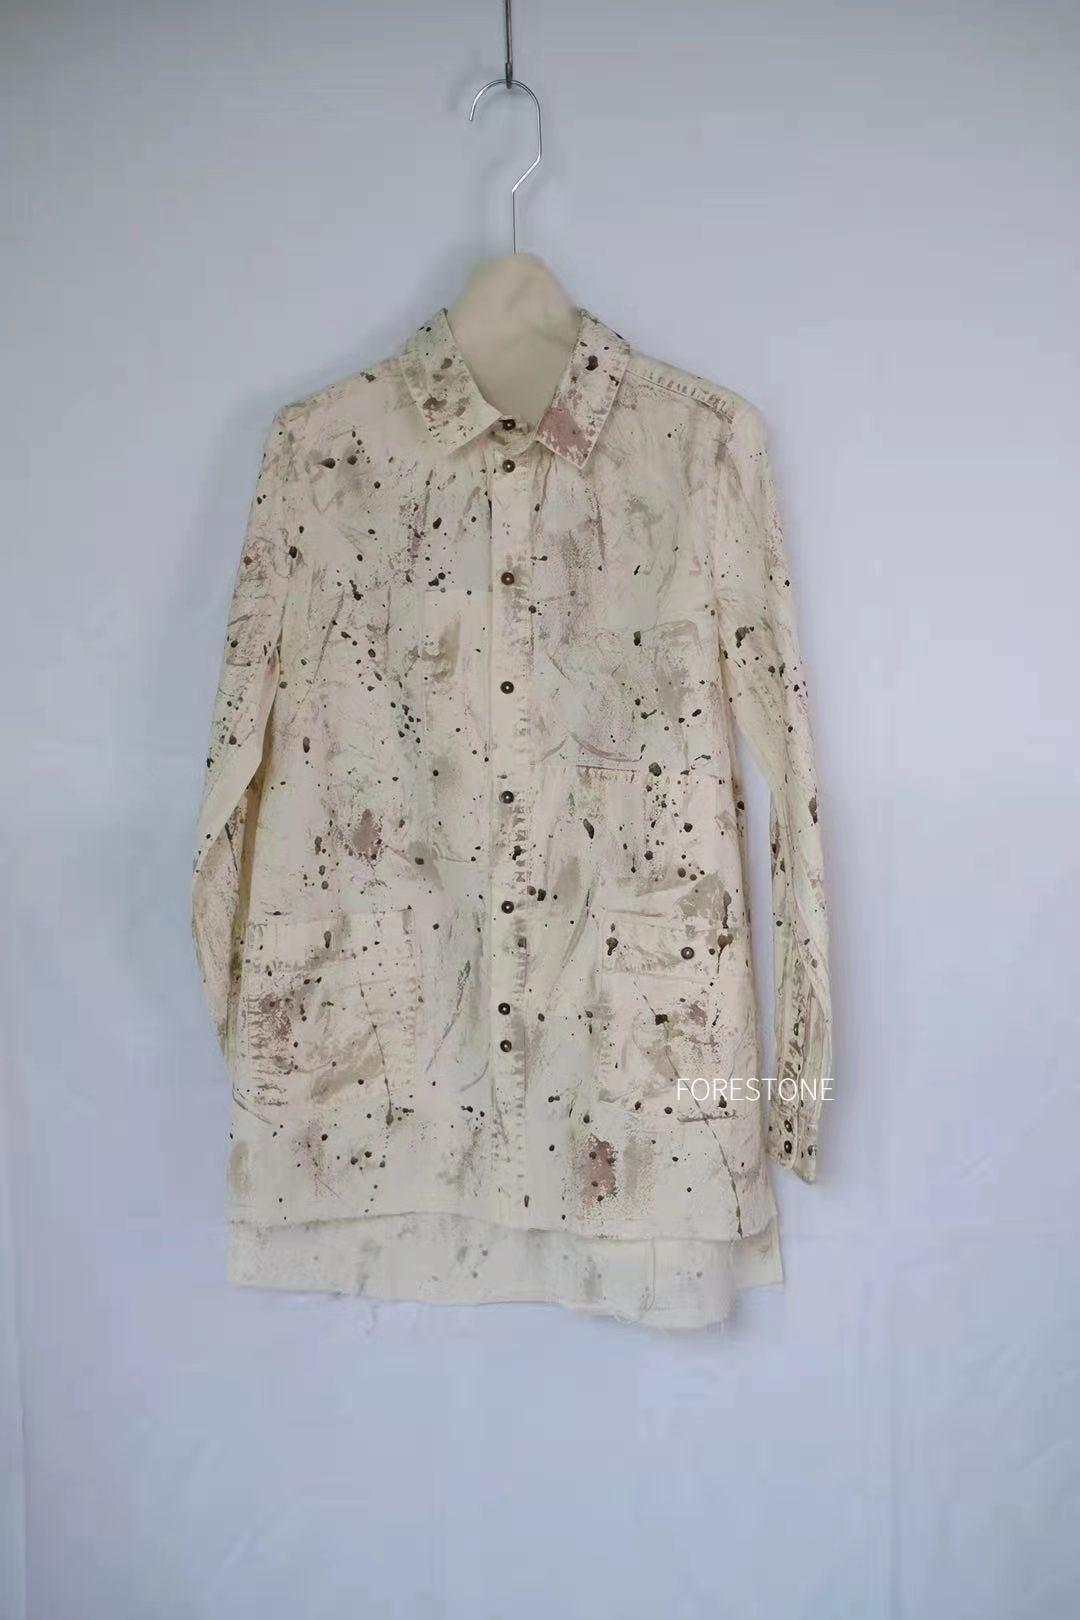 Aleksandr manamis Danish brand white spotted shirt forestone brush stone